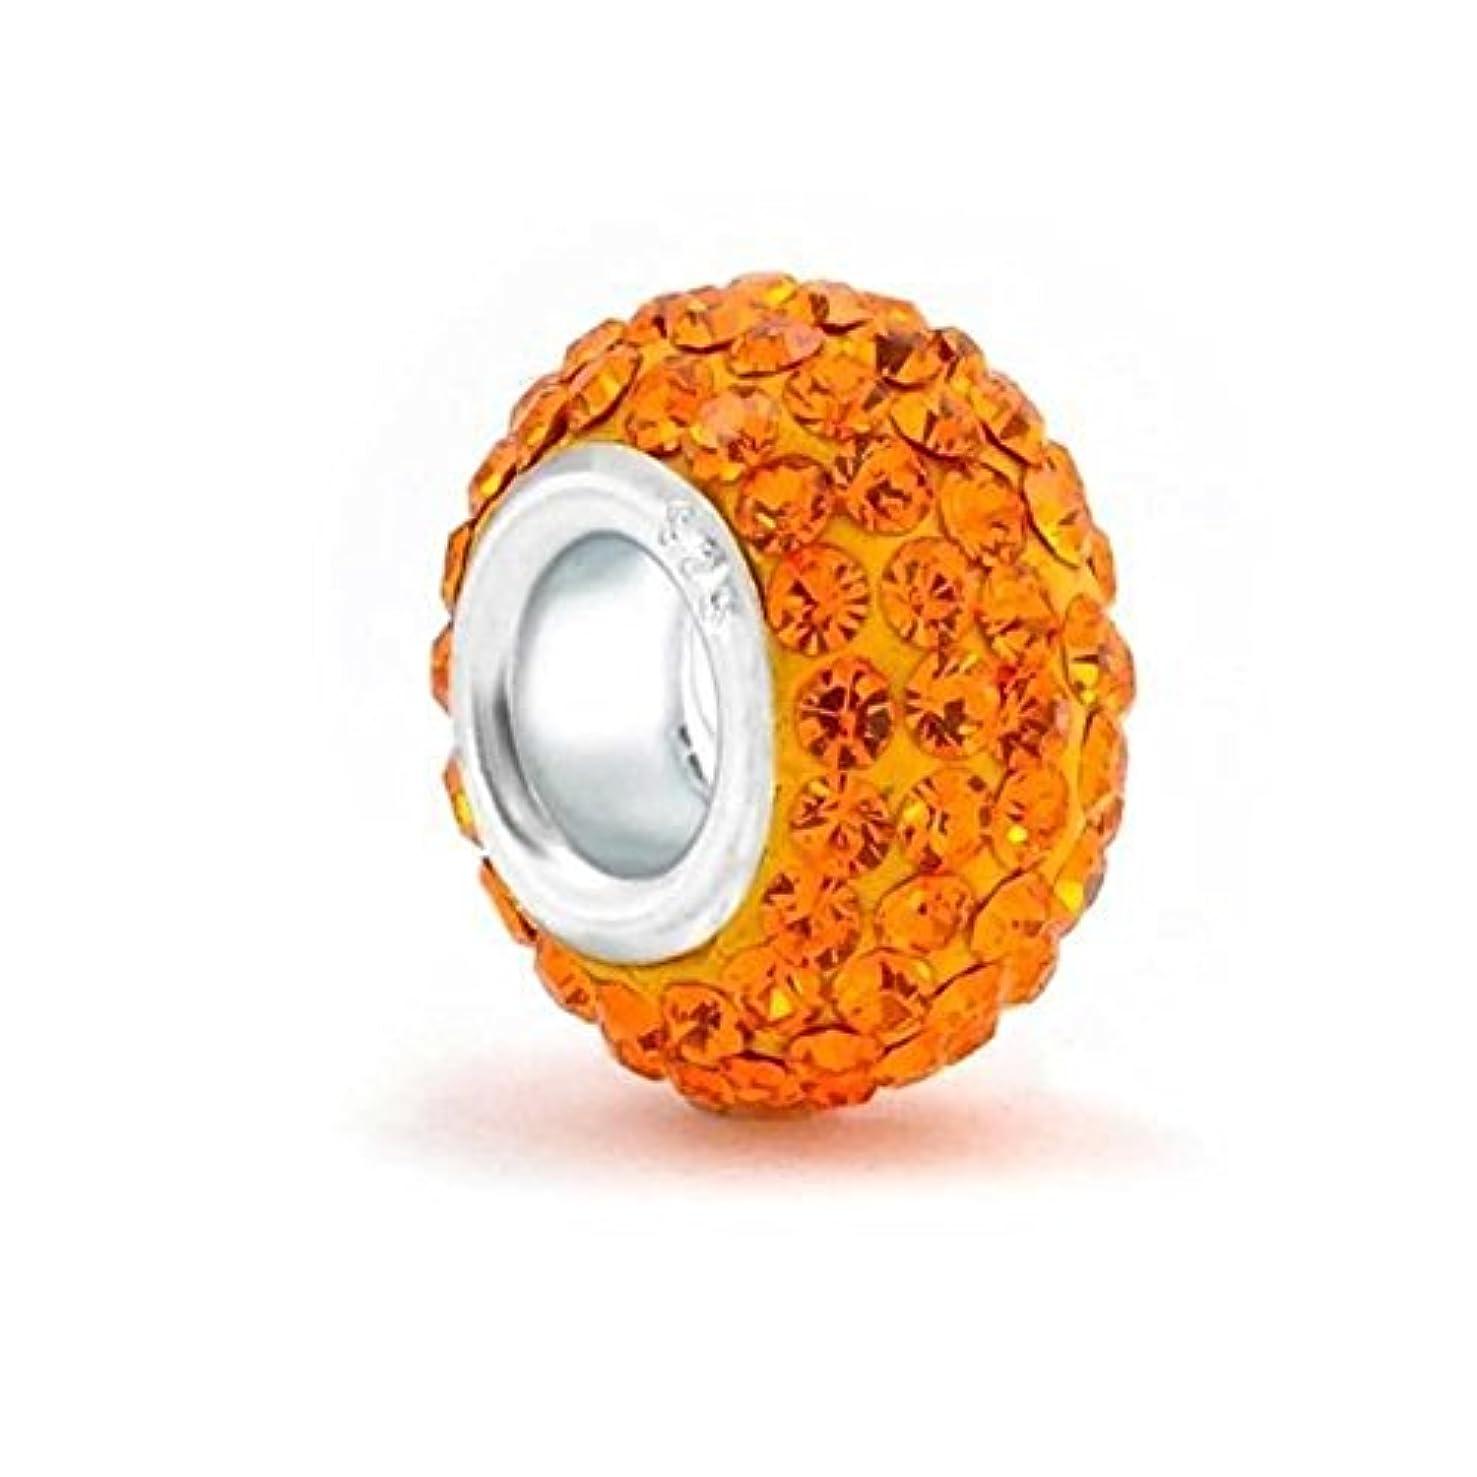 Orange 925 Sterling Silver Bead Fits European Charm Bracelet